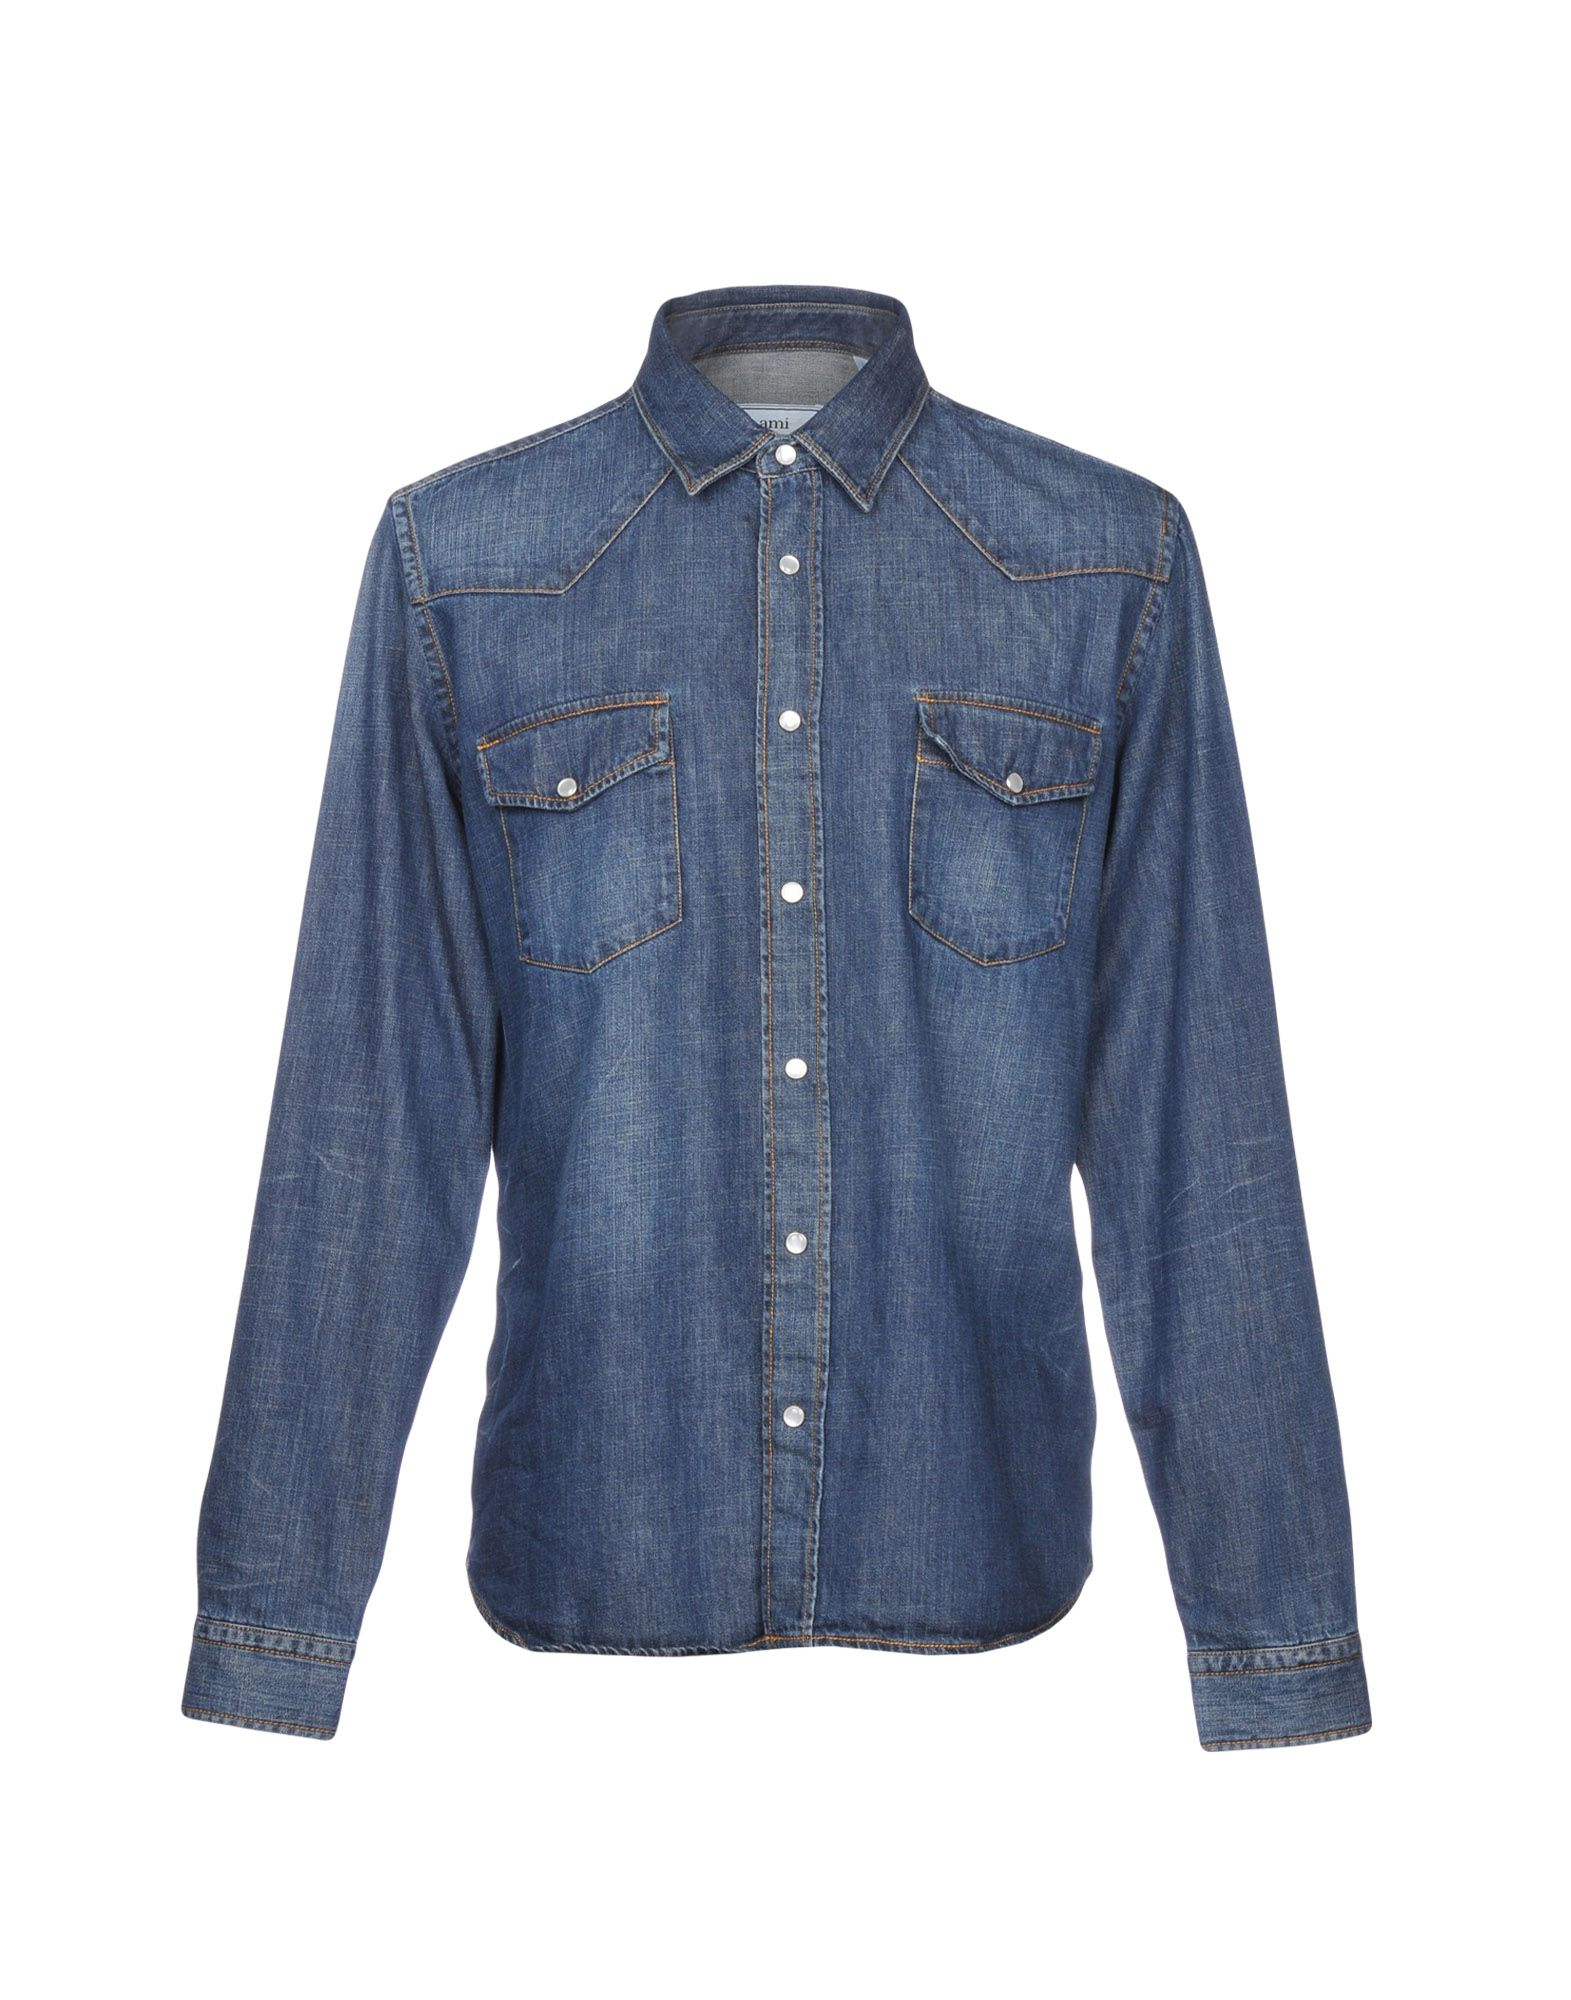 5085060035 Camicia Jeans Ami Alexandre Mattiussi Uomo - 42682607DJ nsriwu1920 ...